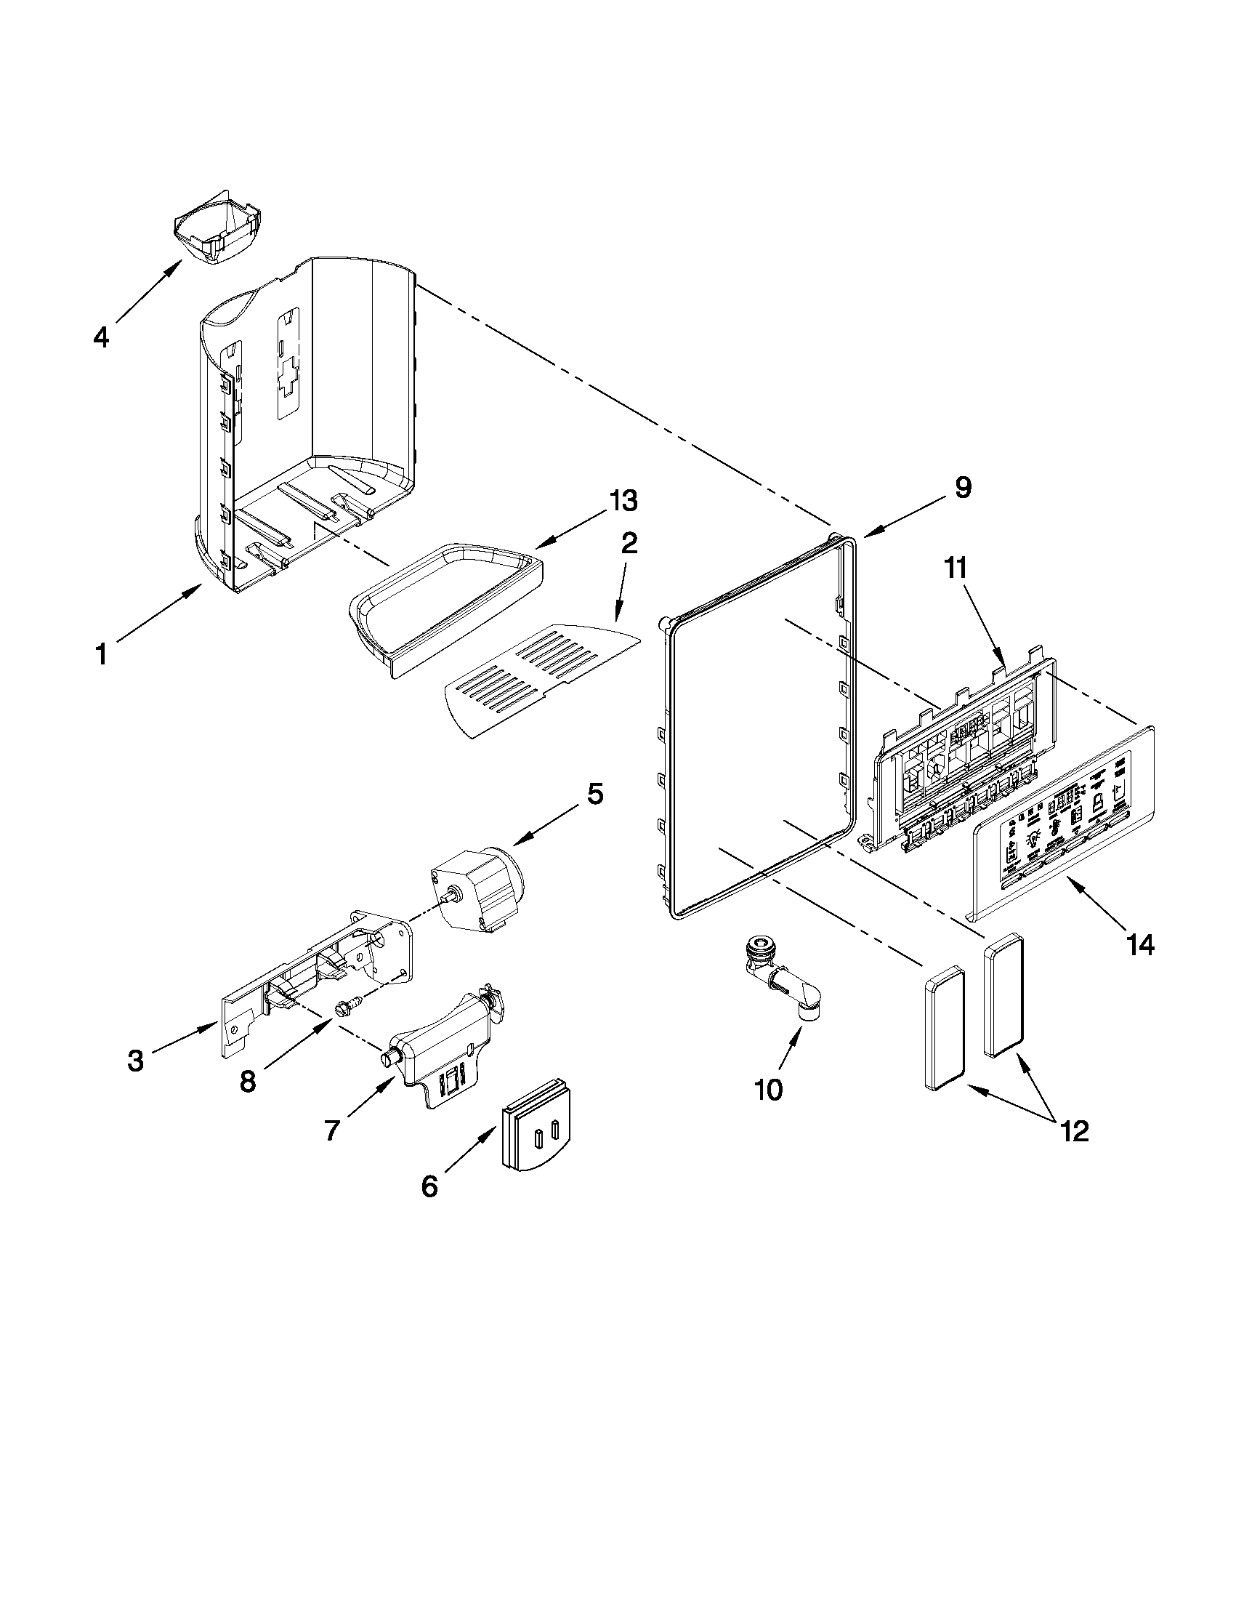 Whirlpool Gold Water Cooler Manual